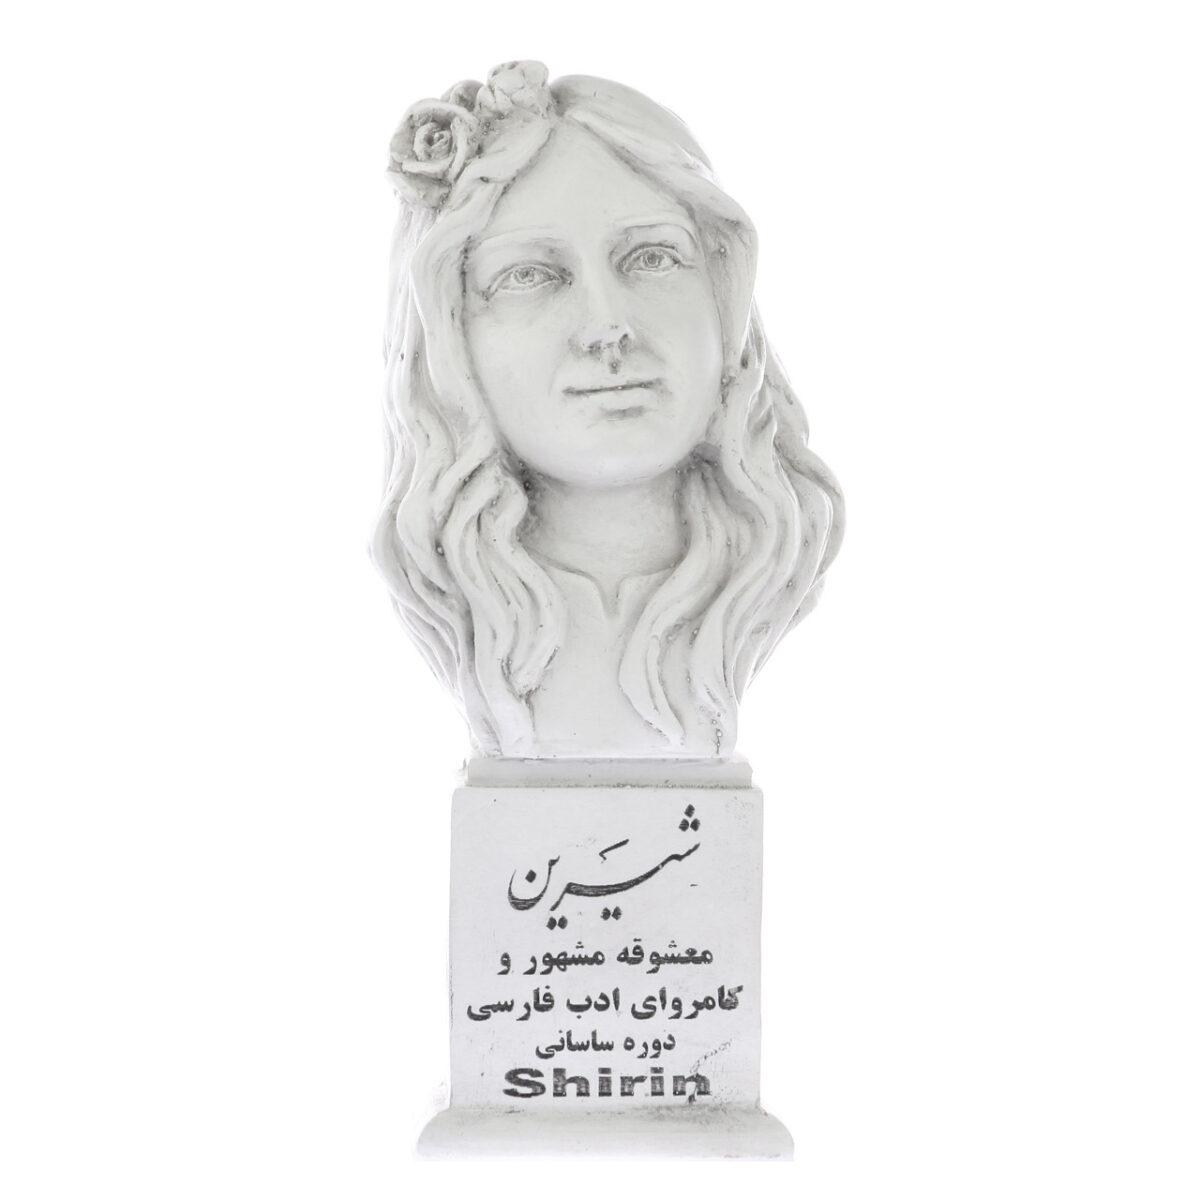 shirin s 1200x1200 - سردیس شیرین